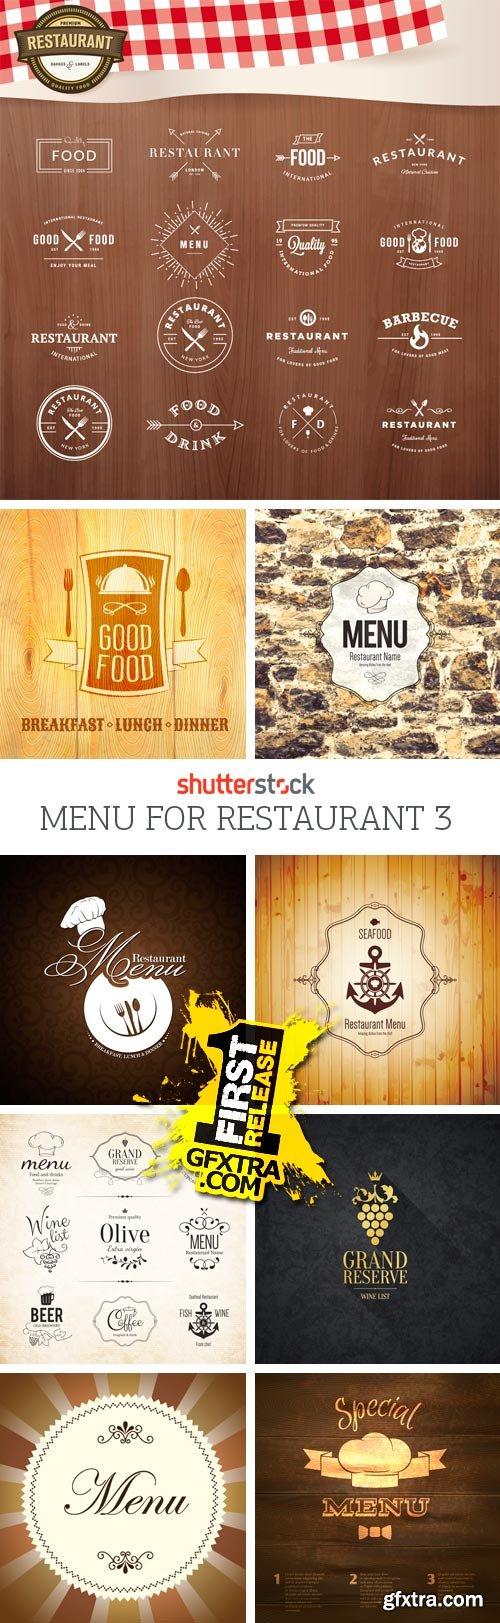 Amazing SS - Menu for Restaurant 3, 25xEPS